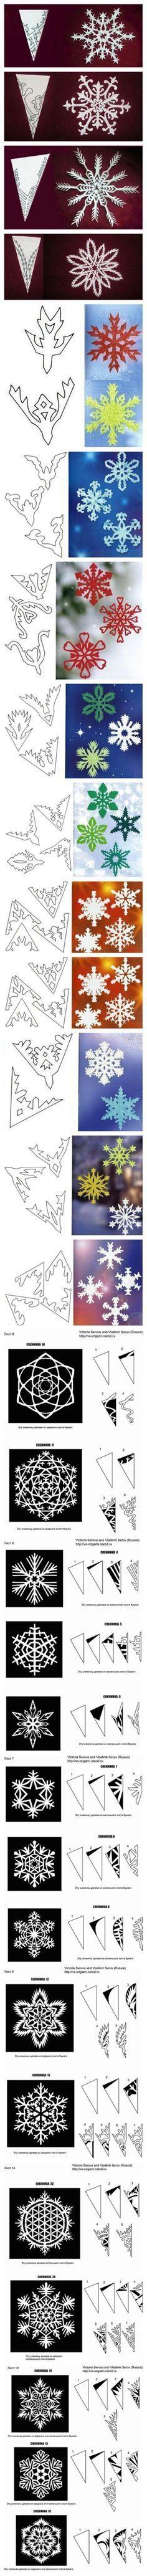 How to Make Excellent Paper Snowflakes Beyond the basics! #DIY #Paper_Snowflakes #joybx